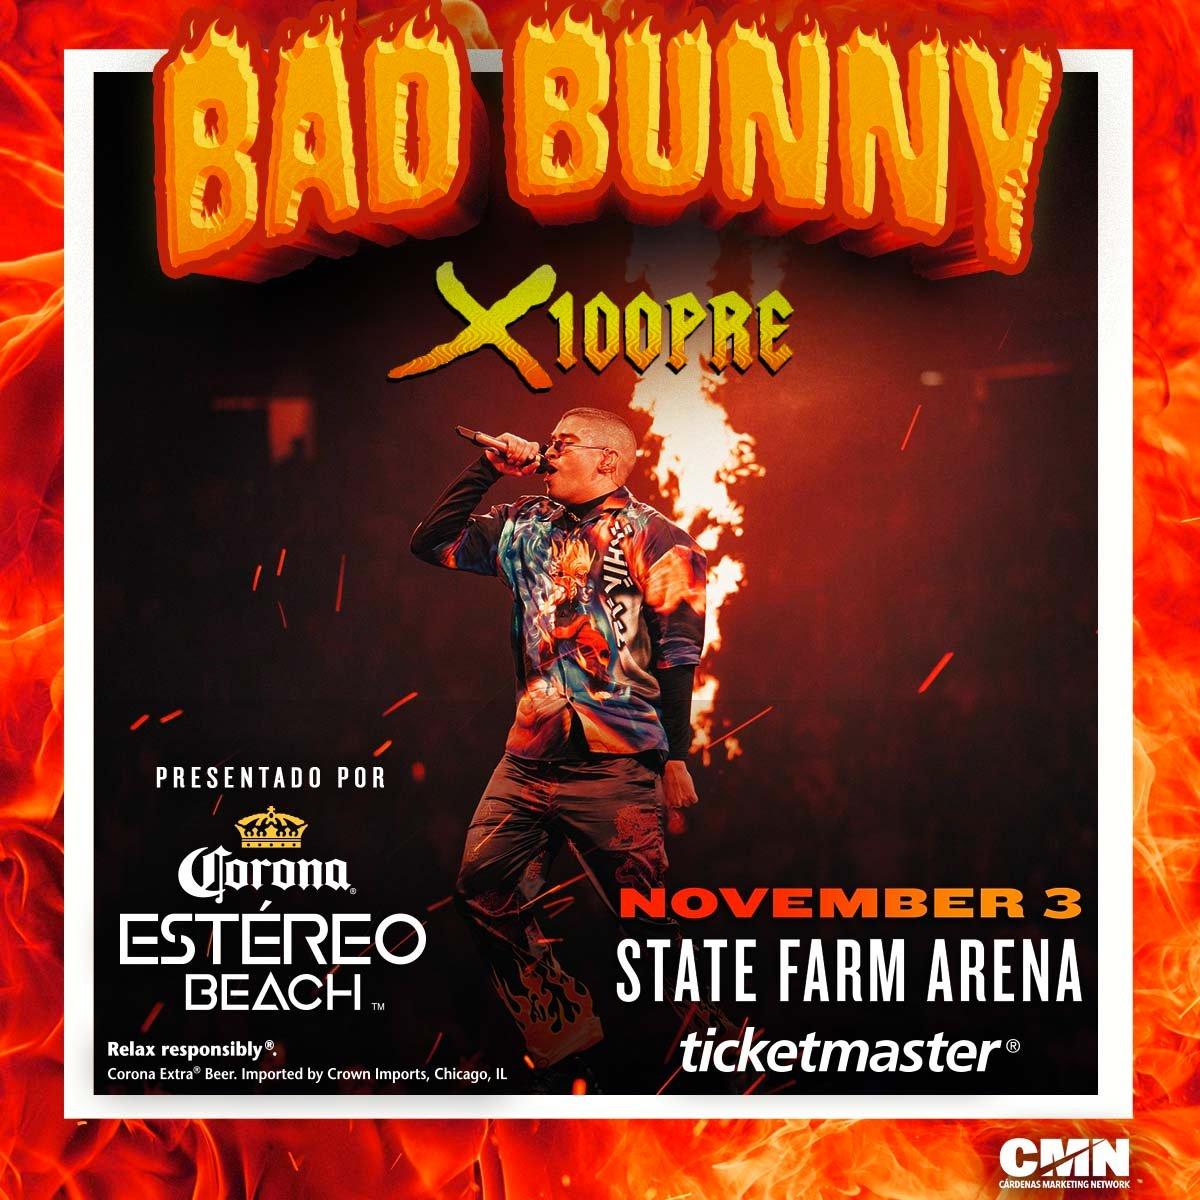 Bad Bunny Corona Estereo Beach concert partnership